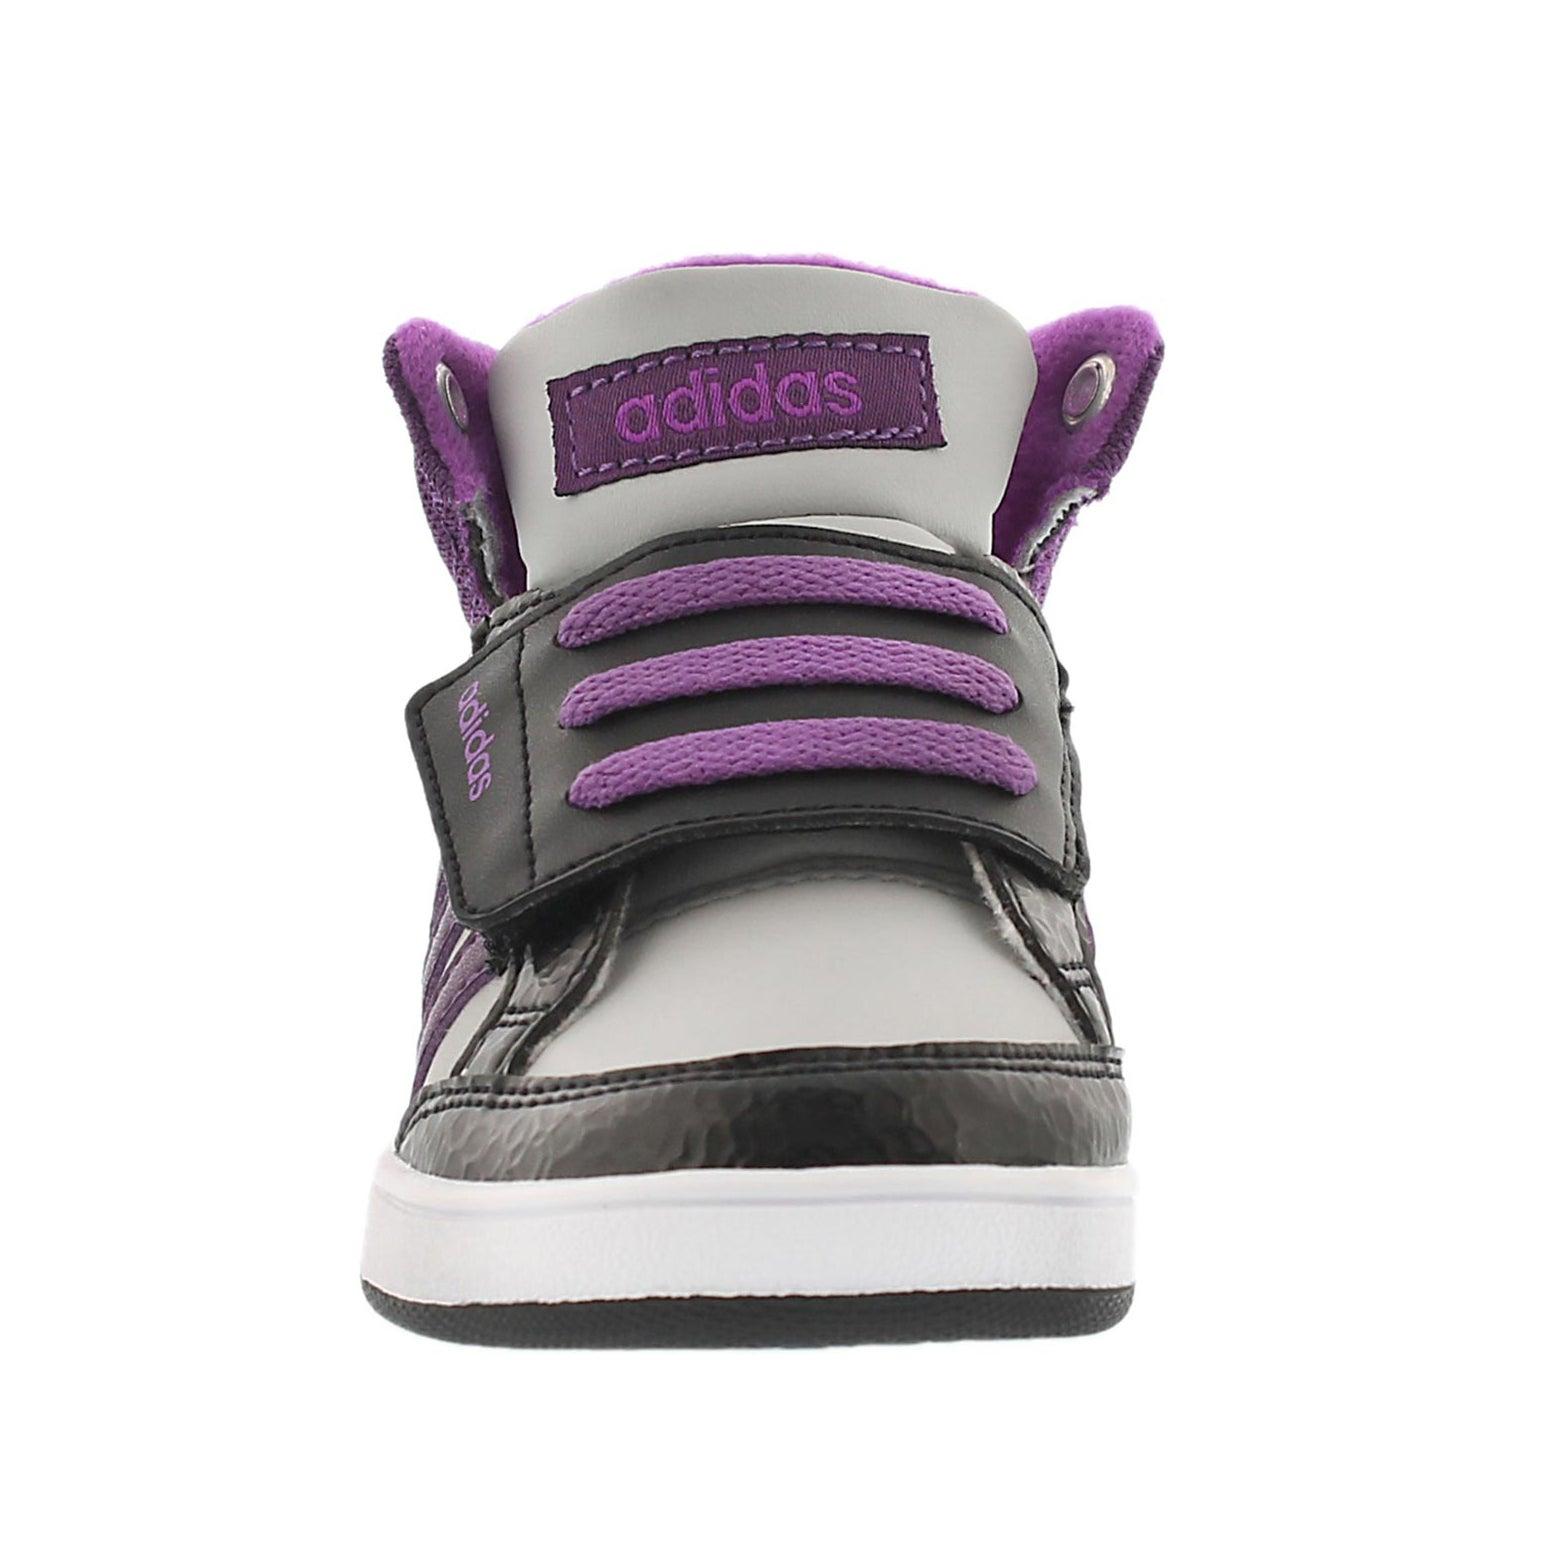 Grls Hoops Mid blk/ppl lace up sneaker